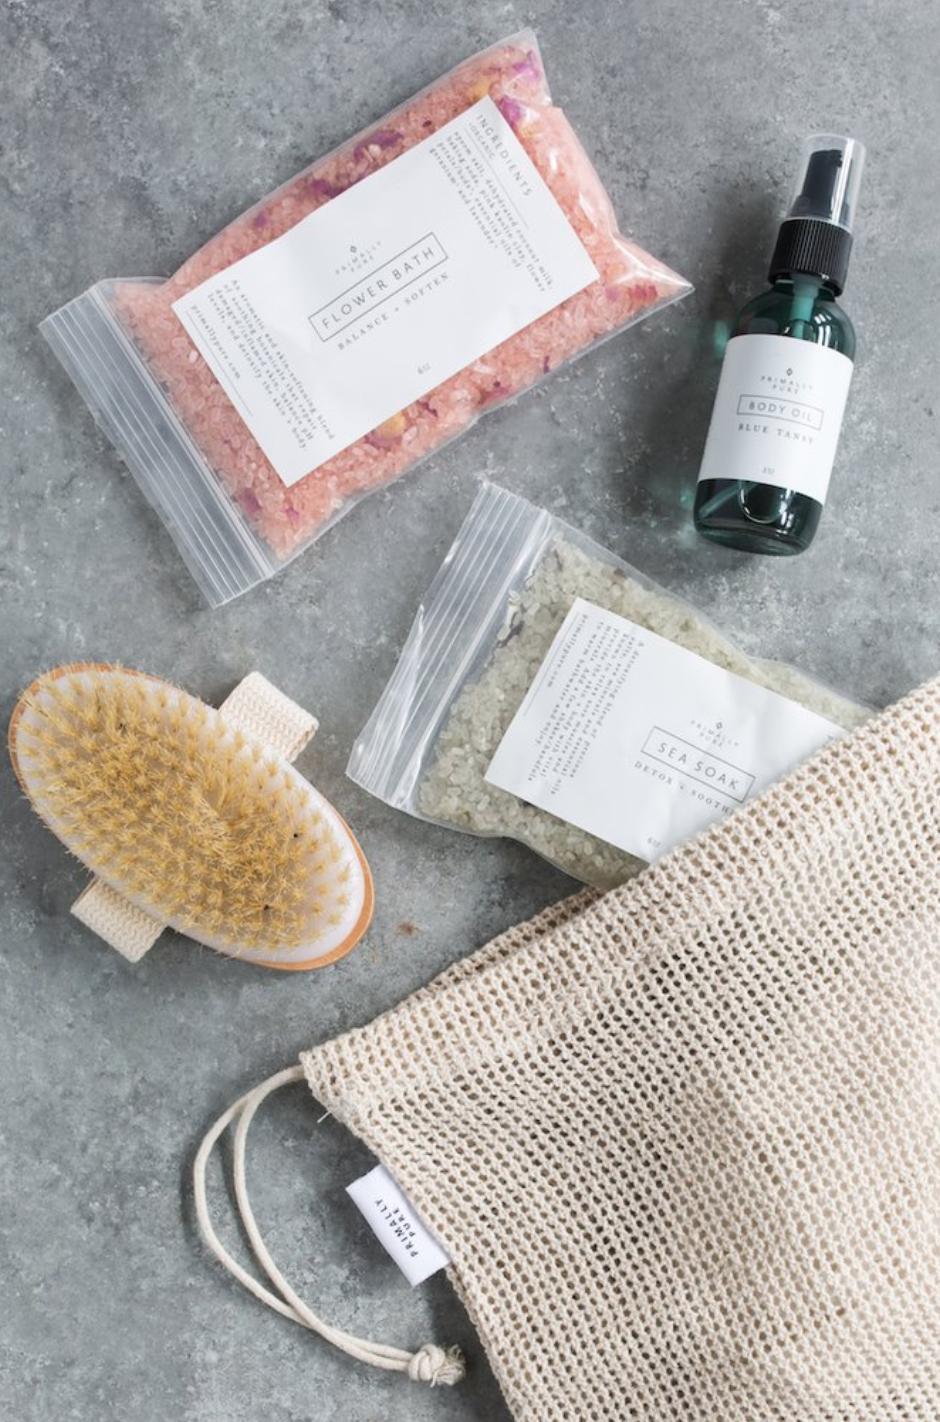 Primally Pure Spa Kit | Kind Gift Guide akindjourney.com